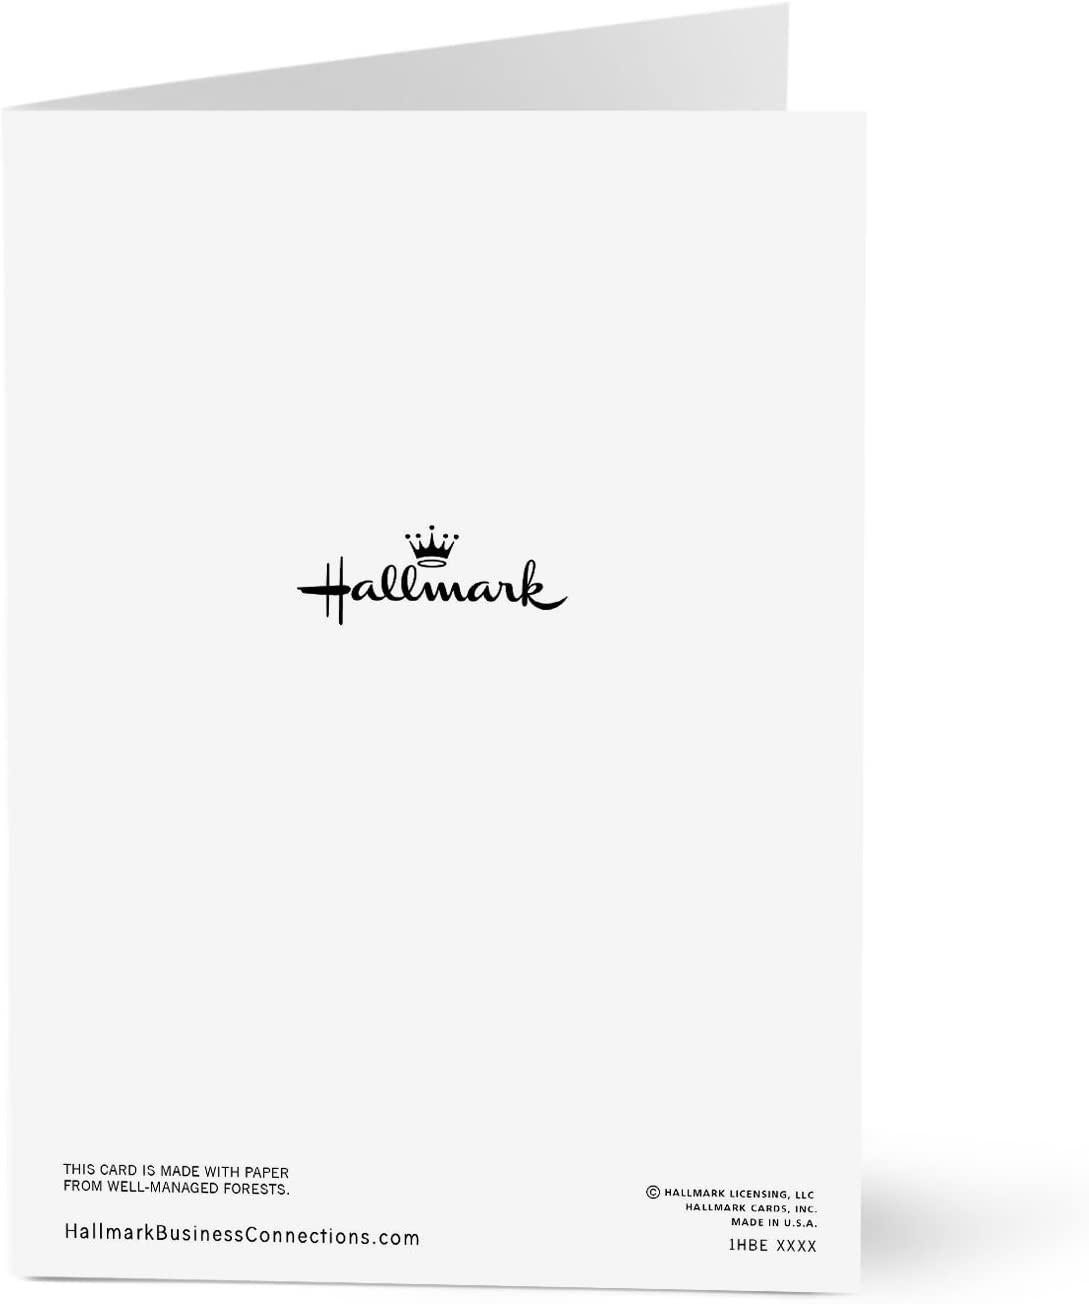 Elegant Work Anniversary Hallmark Business Work Anniversary Card Pack of 25 Greeting Cards